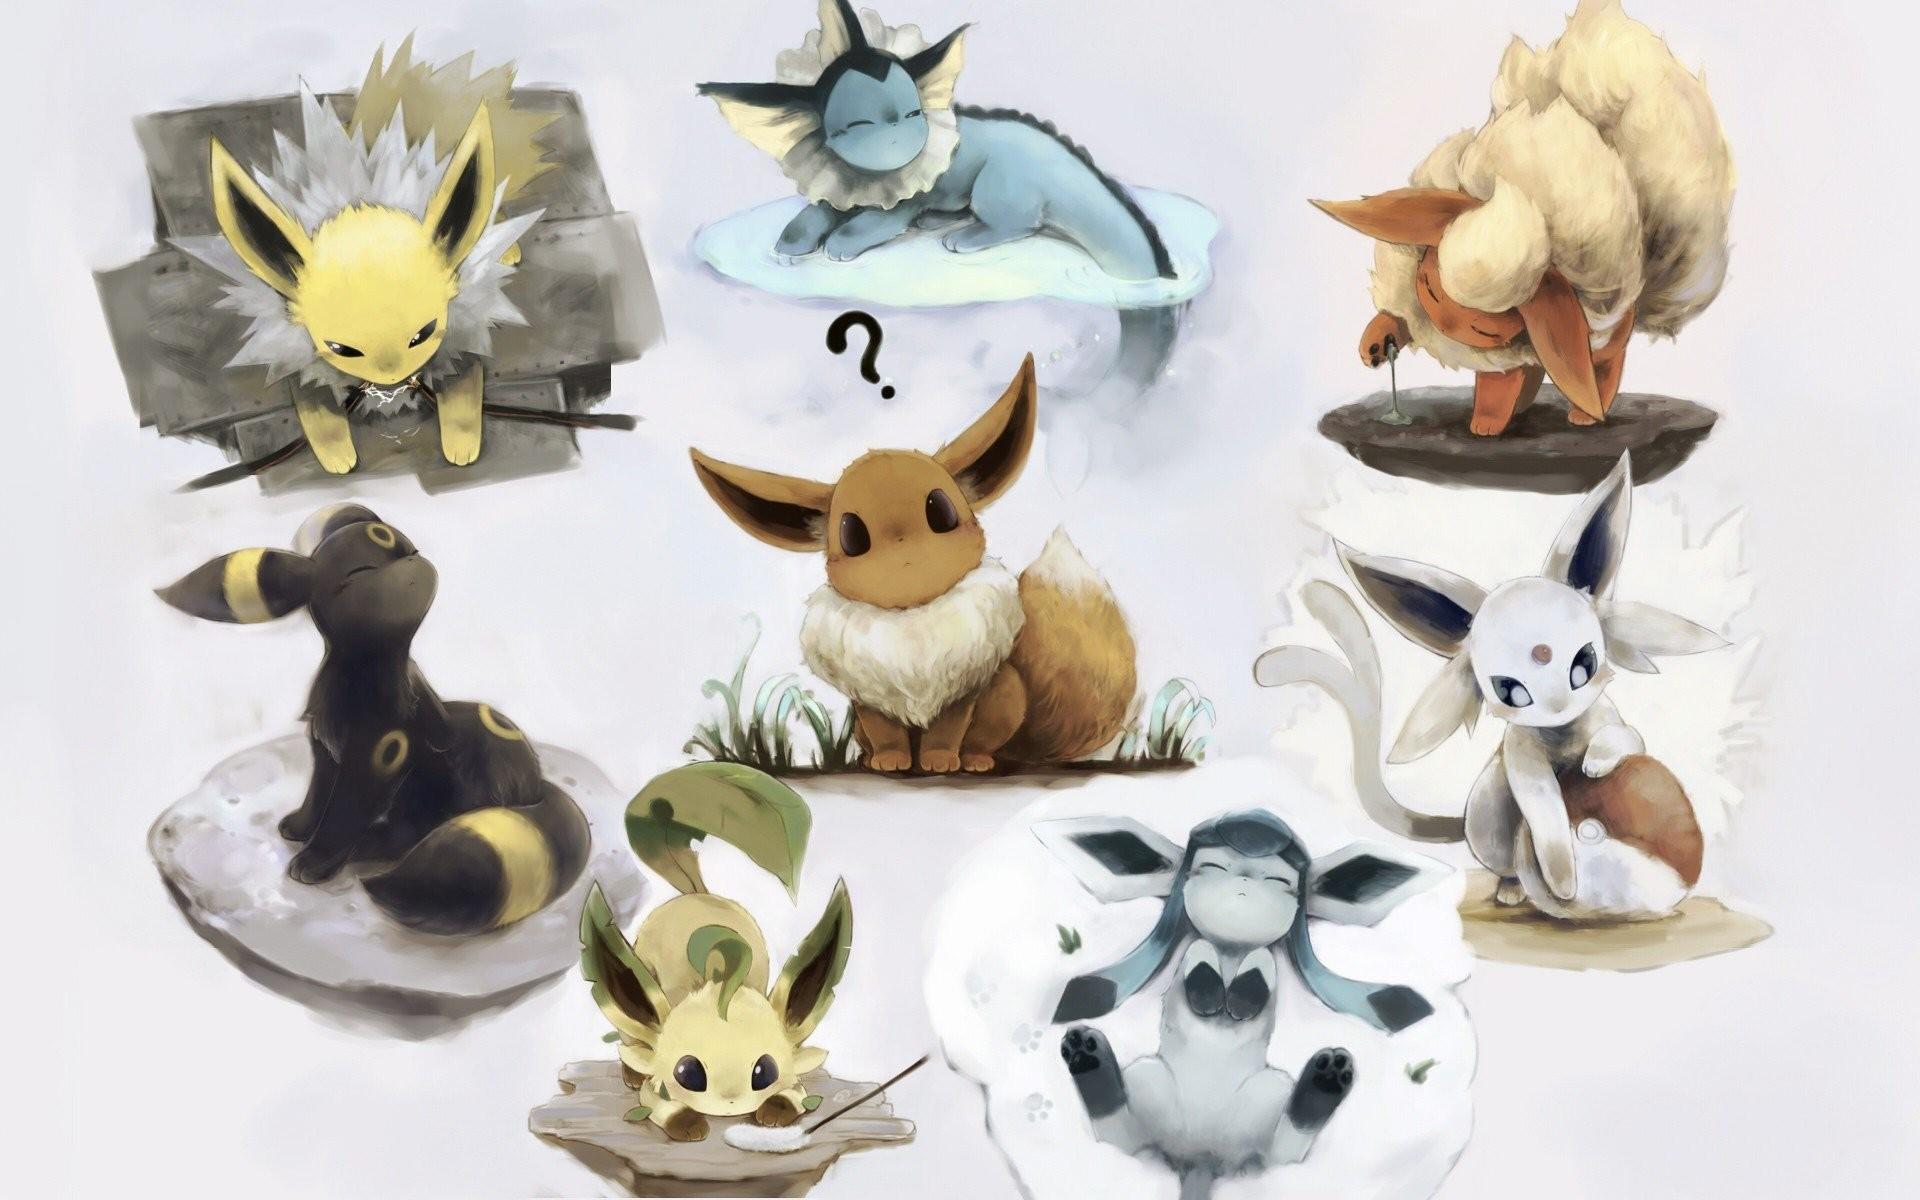 Pokemon Flareon Eevee Espeon Umbreon Vaporeon Jolteon Leafeon Glaceon  wallpaper | | 284049 | WallpaperUP